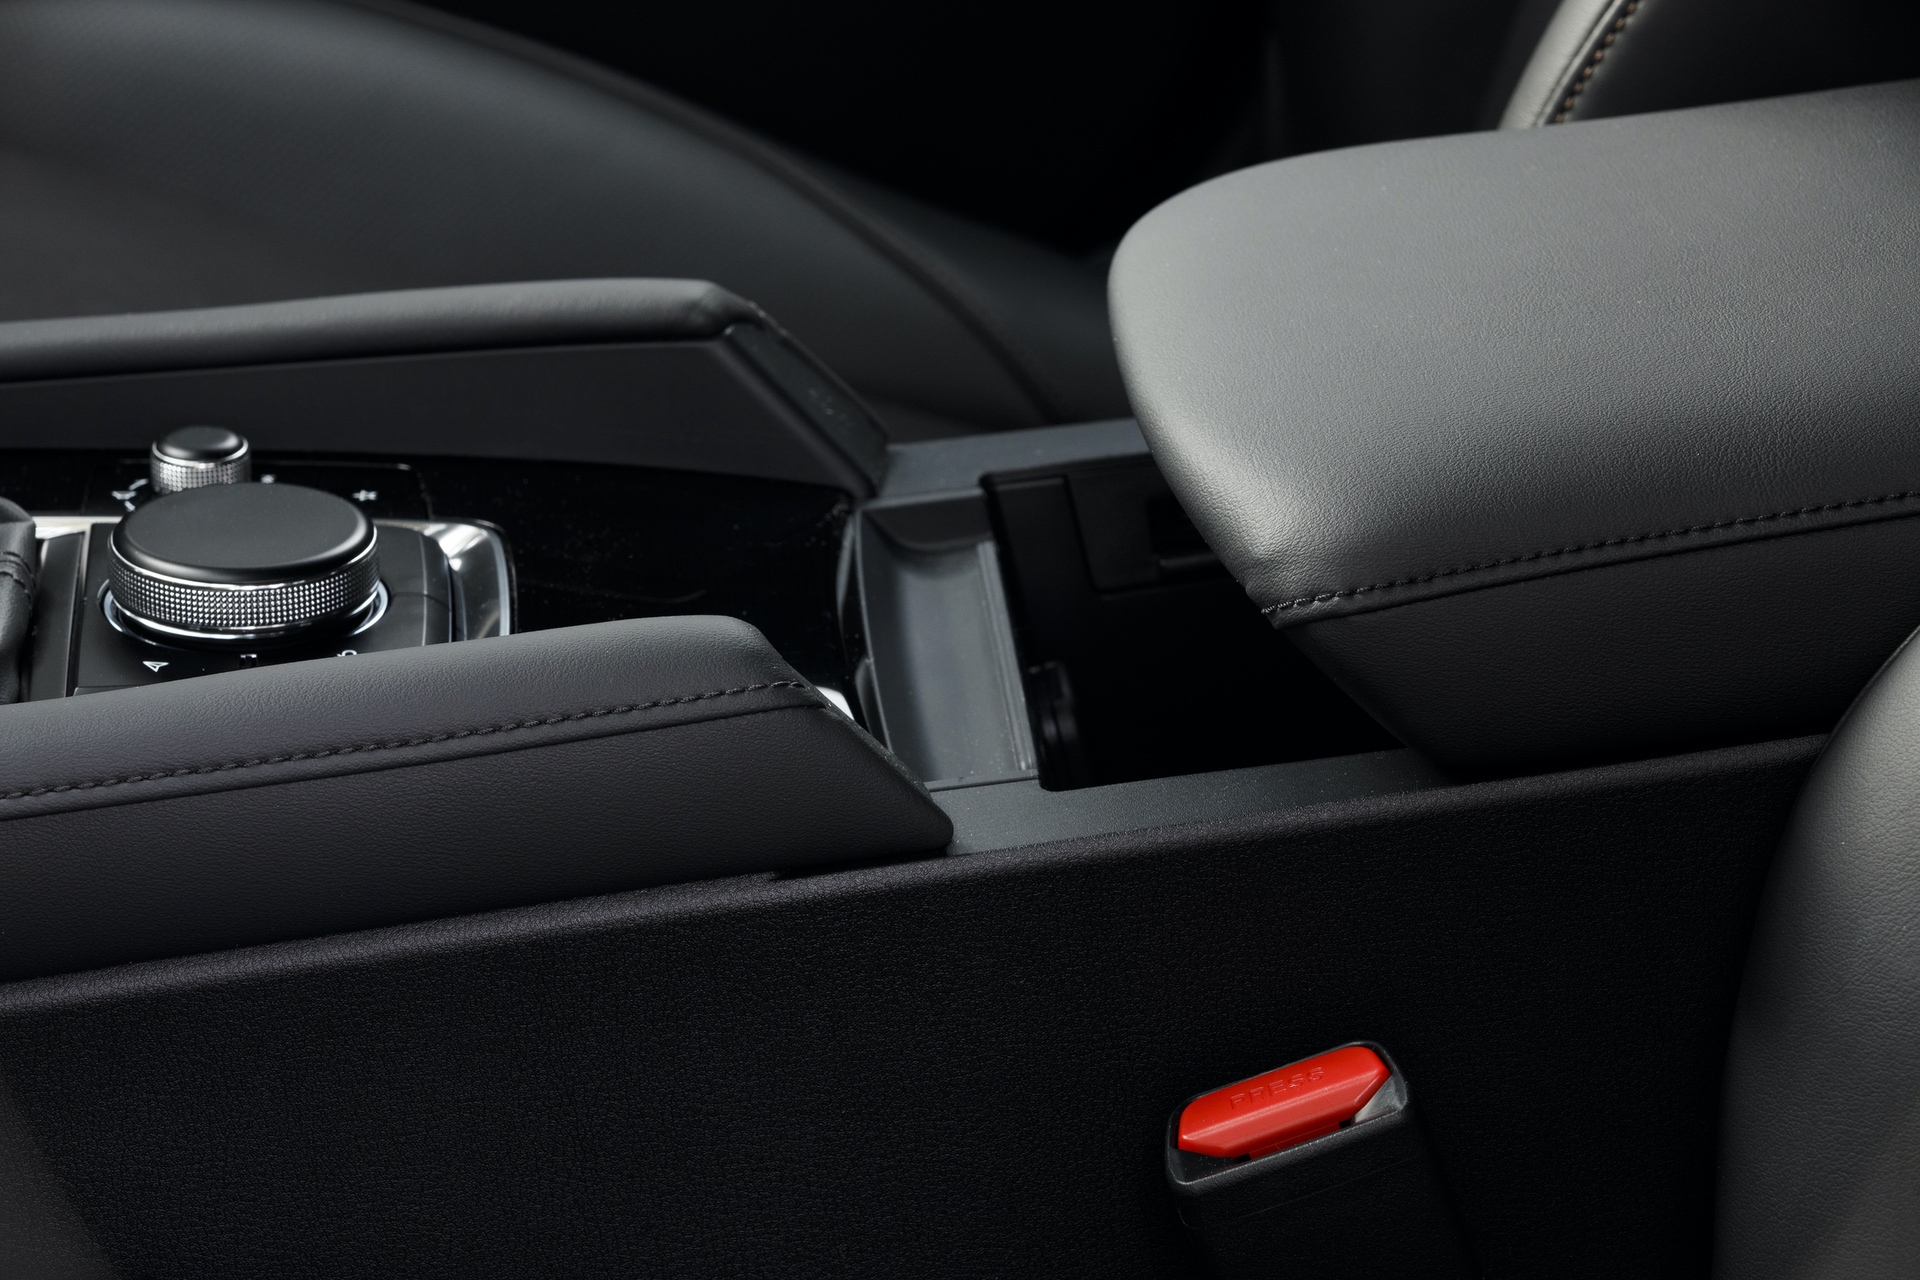 2019-Mazda3-Hatchback_36